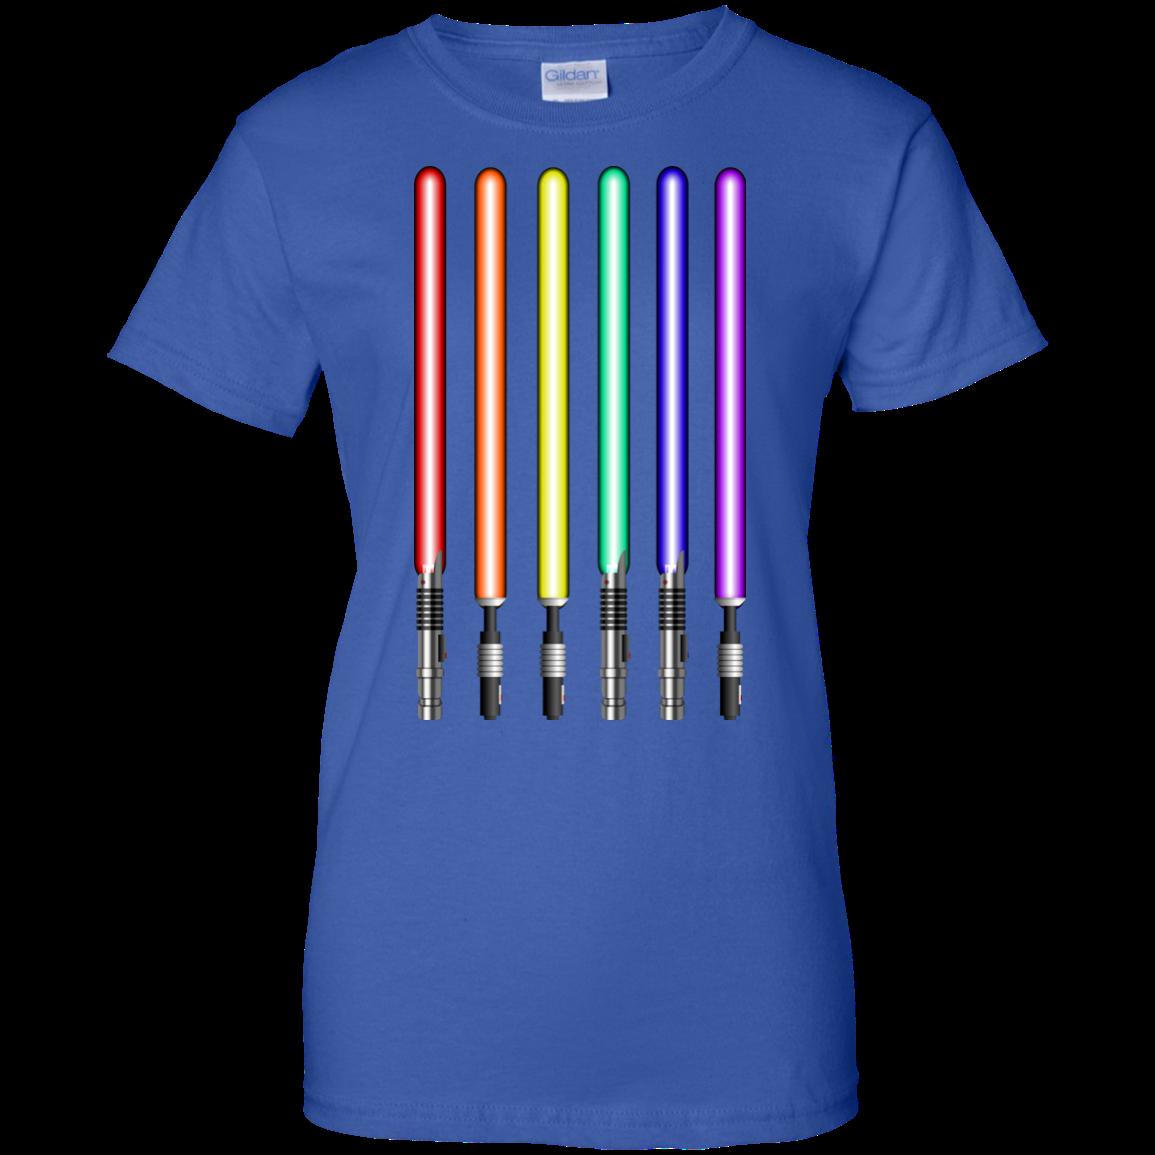 image 885px Star Wars Lightsaber Rainbow Shirt (Tee Hoodies Tank Top)